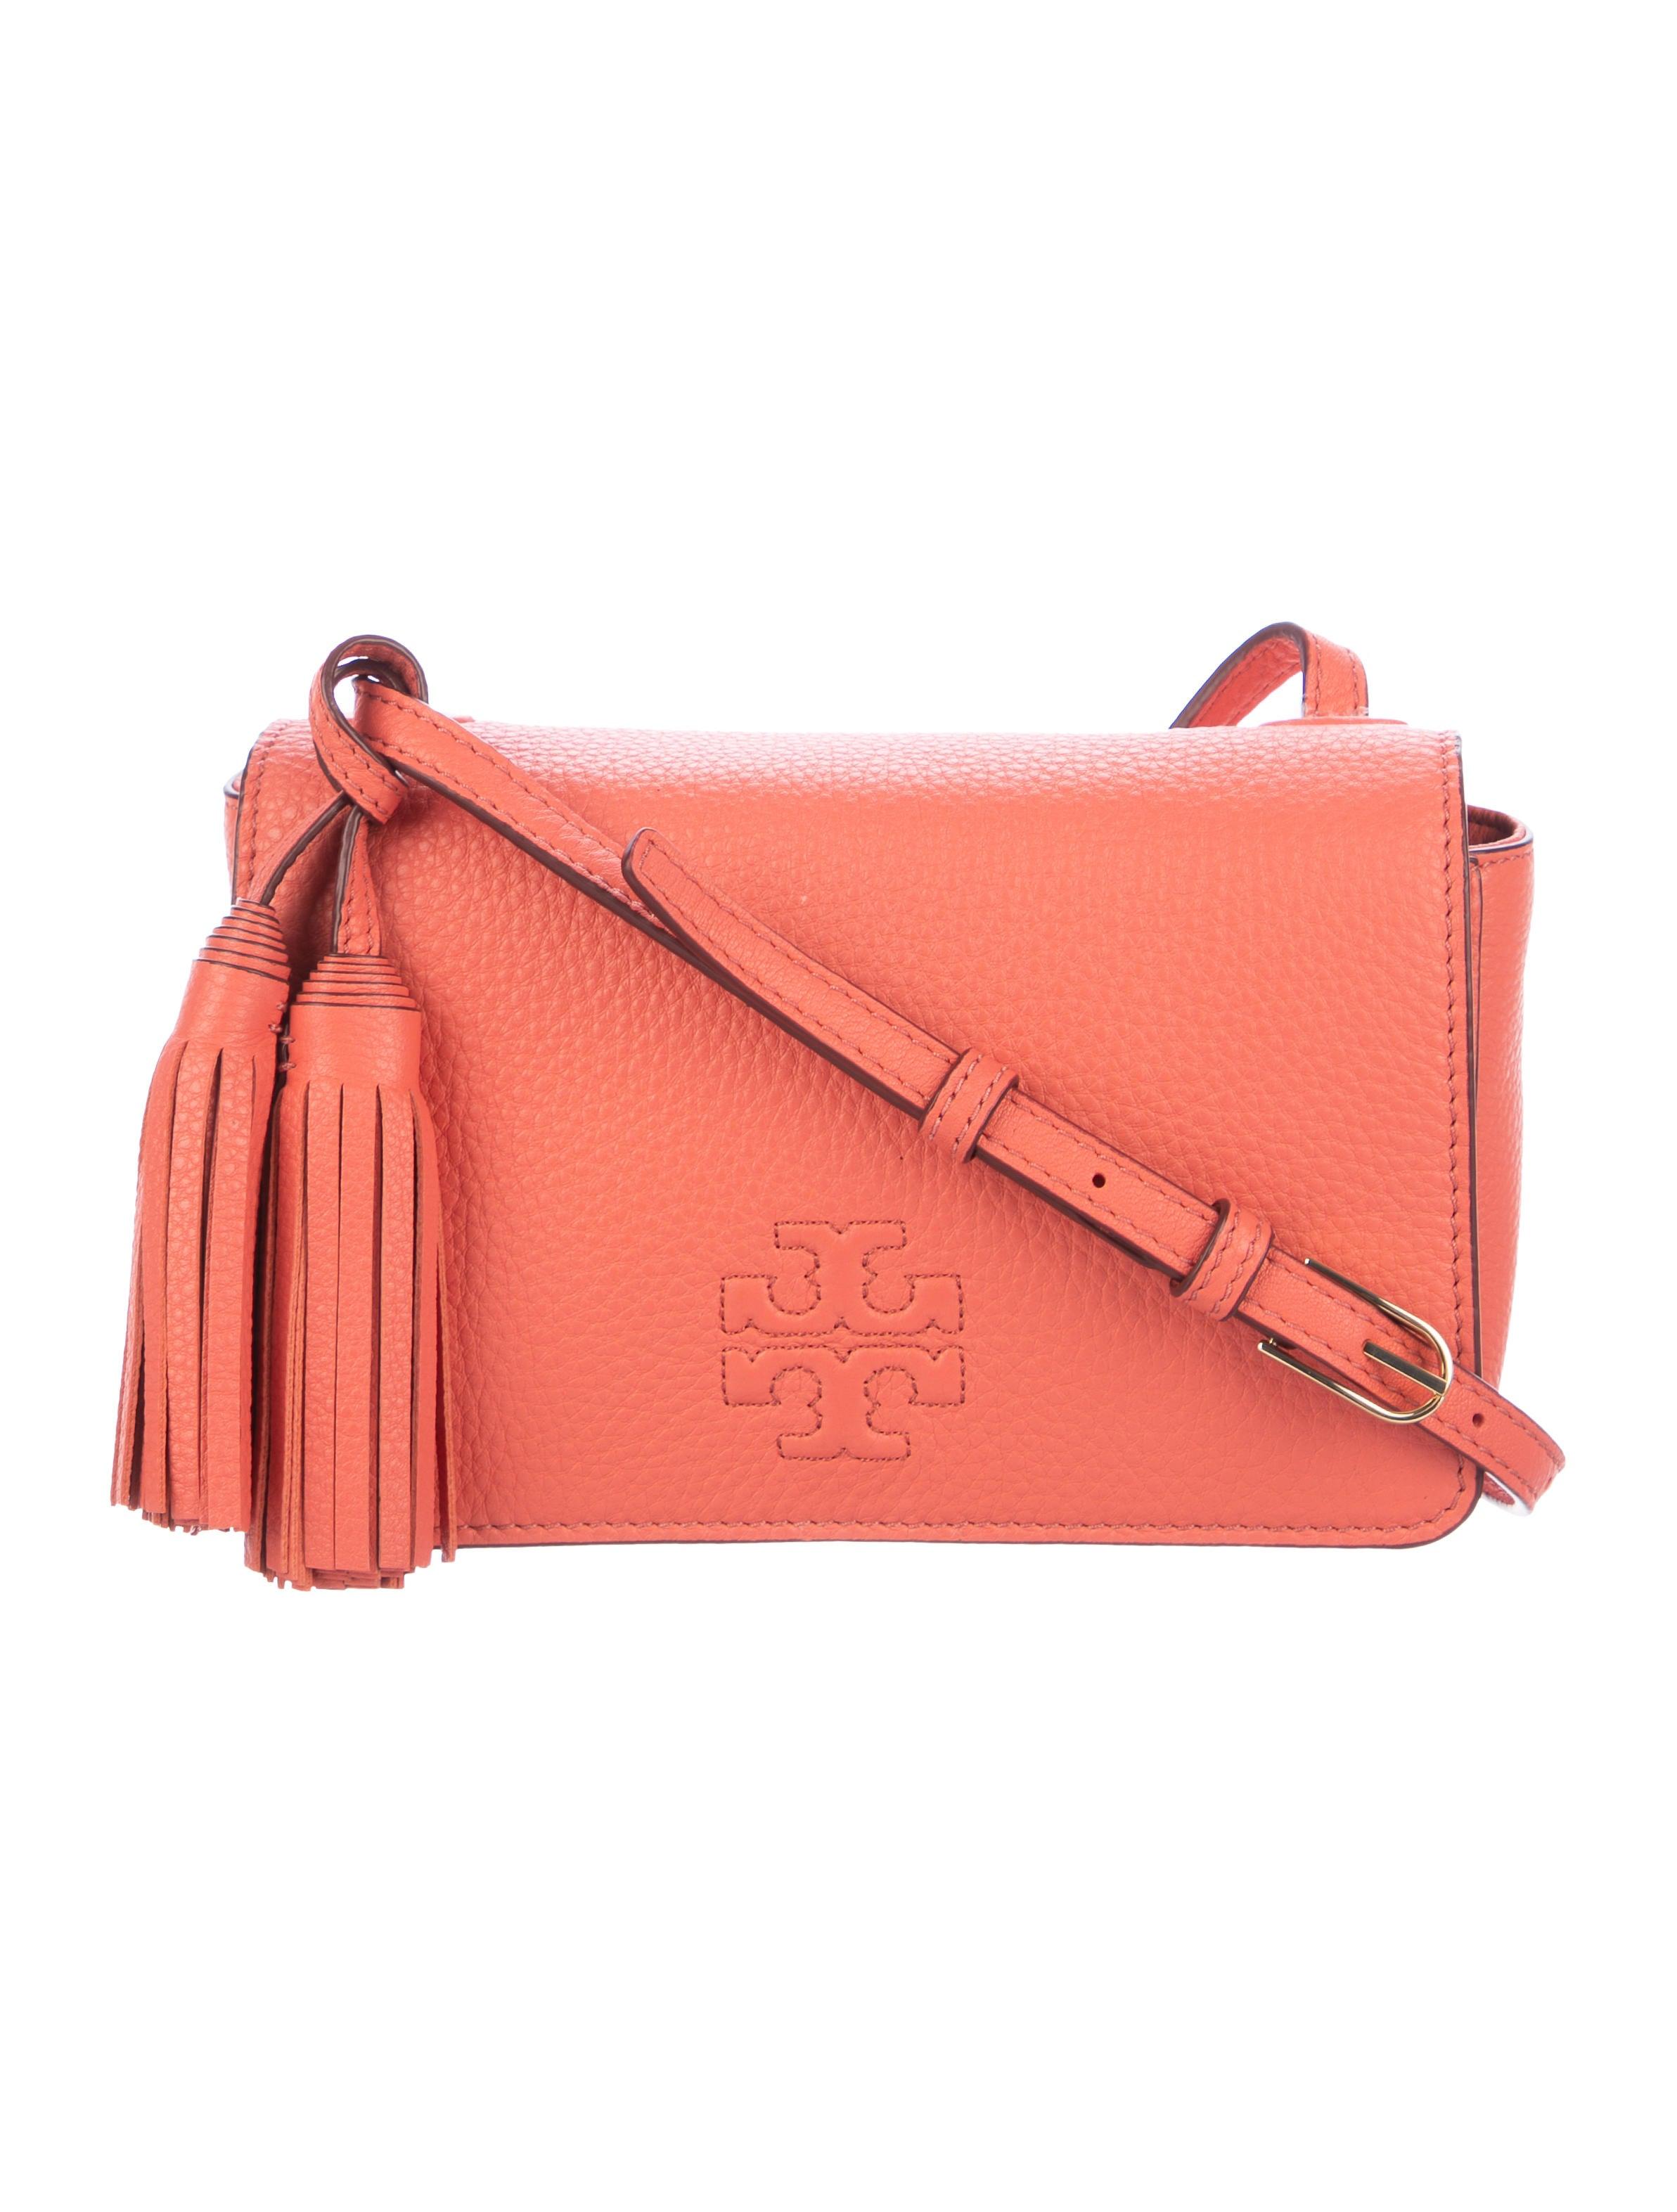 bc46b25c499 Tory Burch Thea Mini Crossbody Bag w/ Tags - Handbags - WTO160285 ...